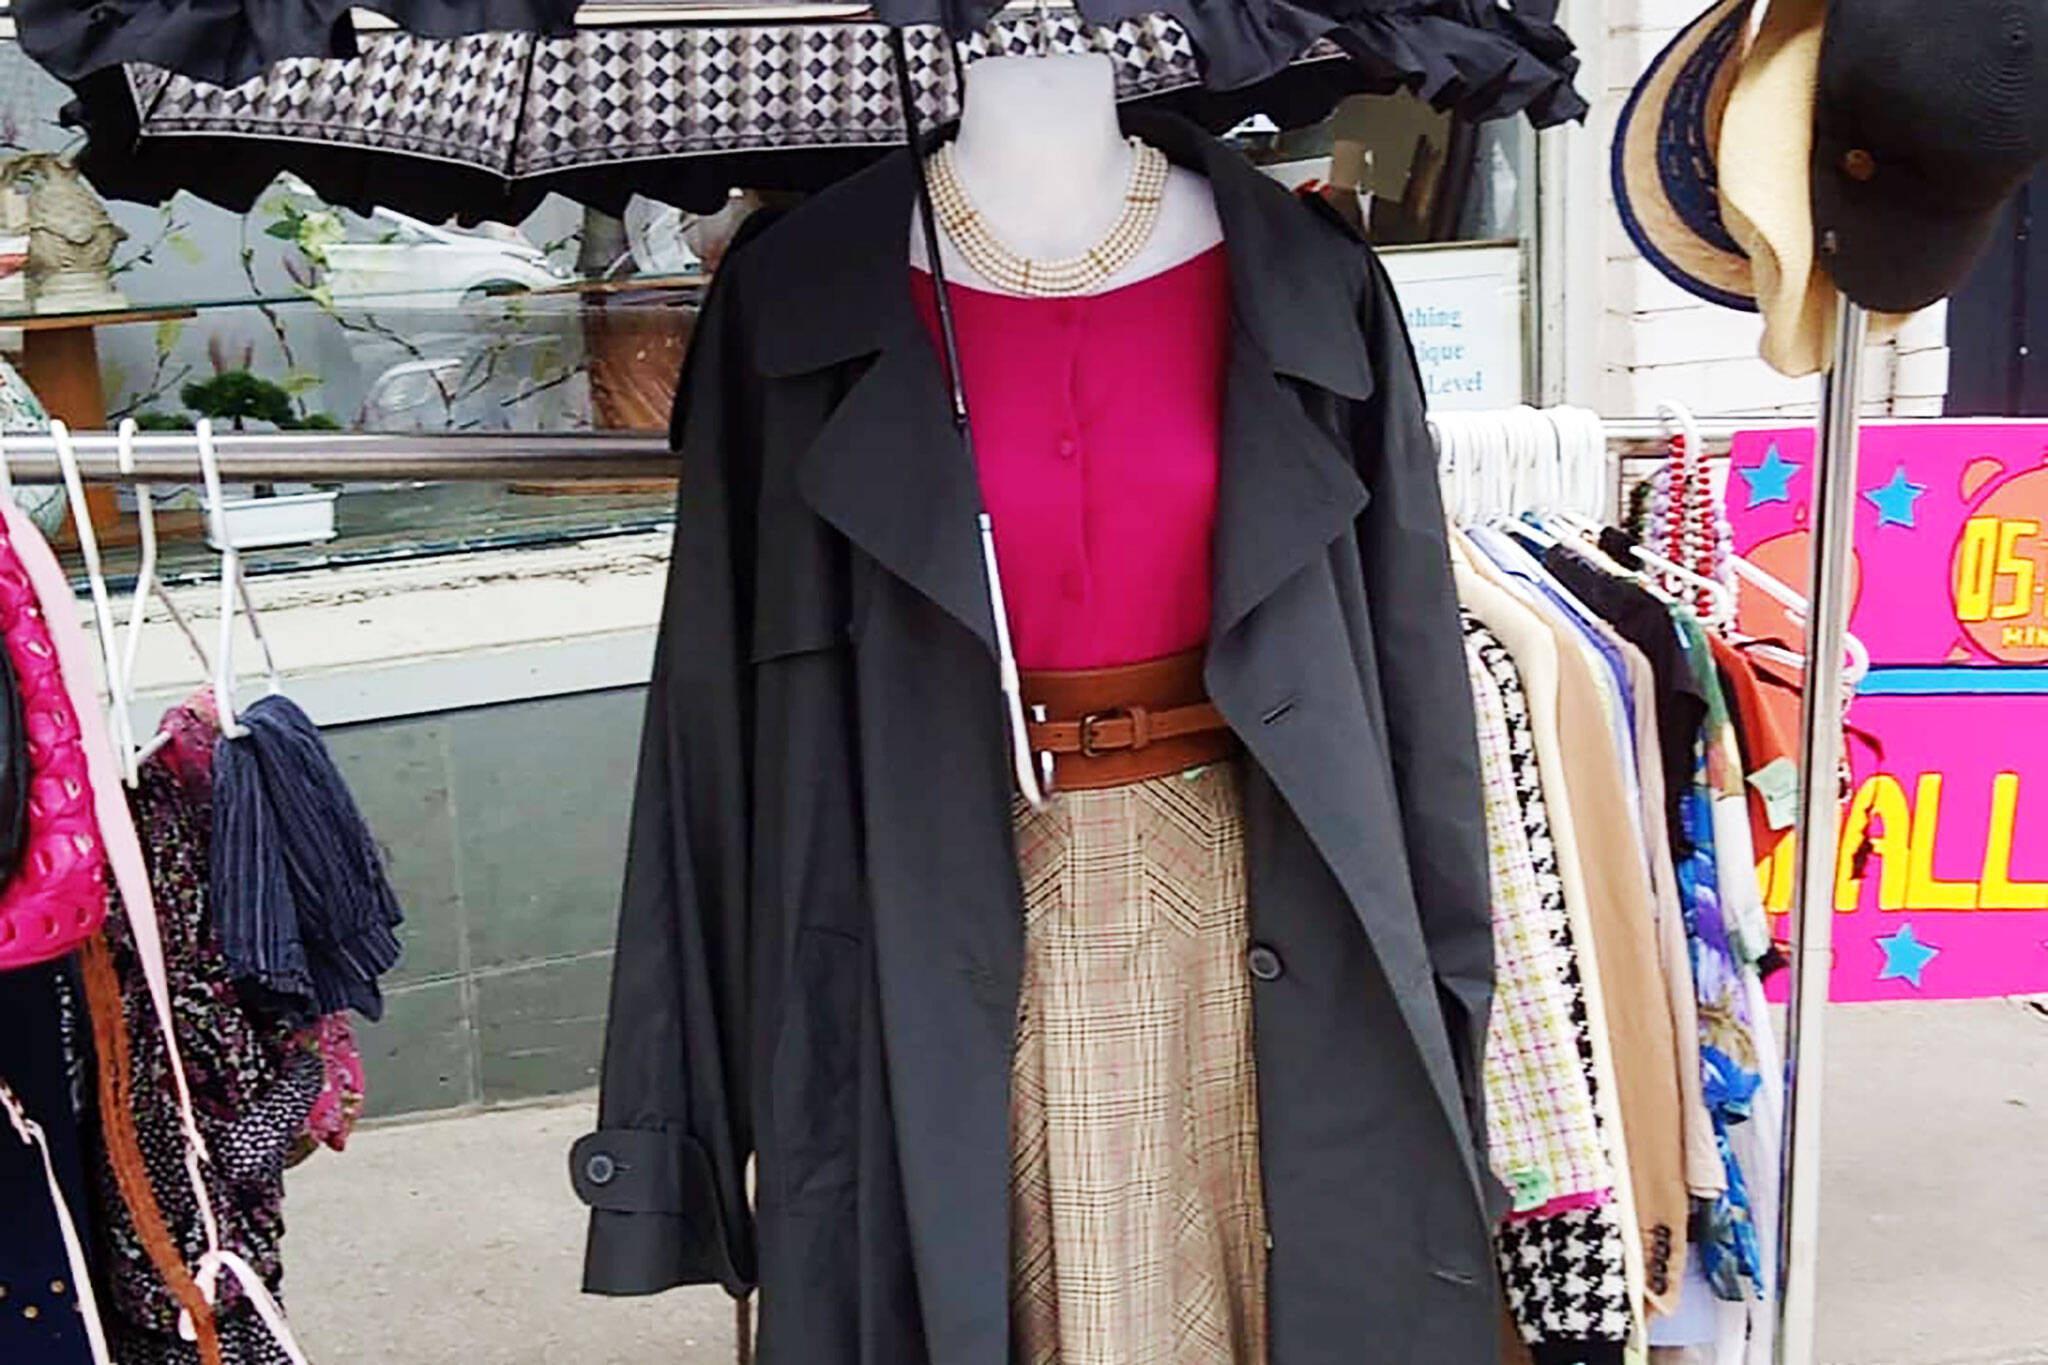 pegasus thrift store toronto